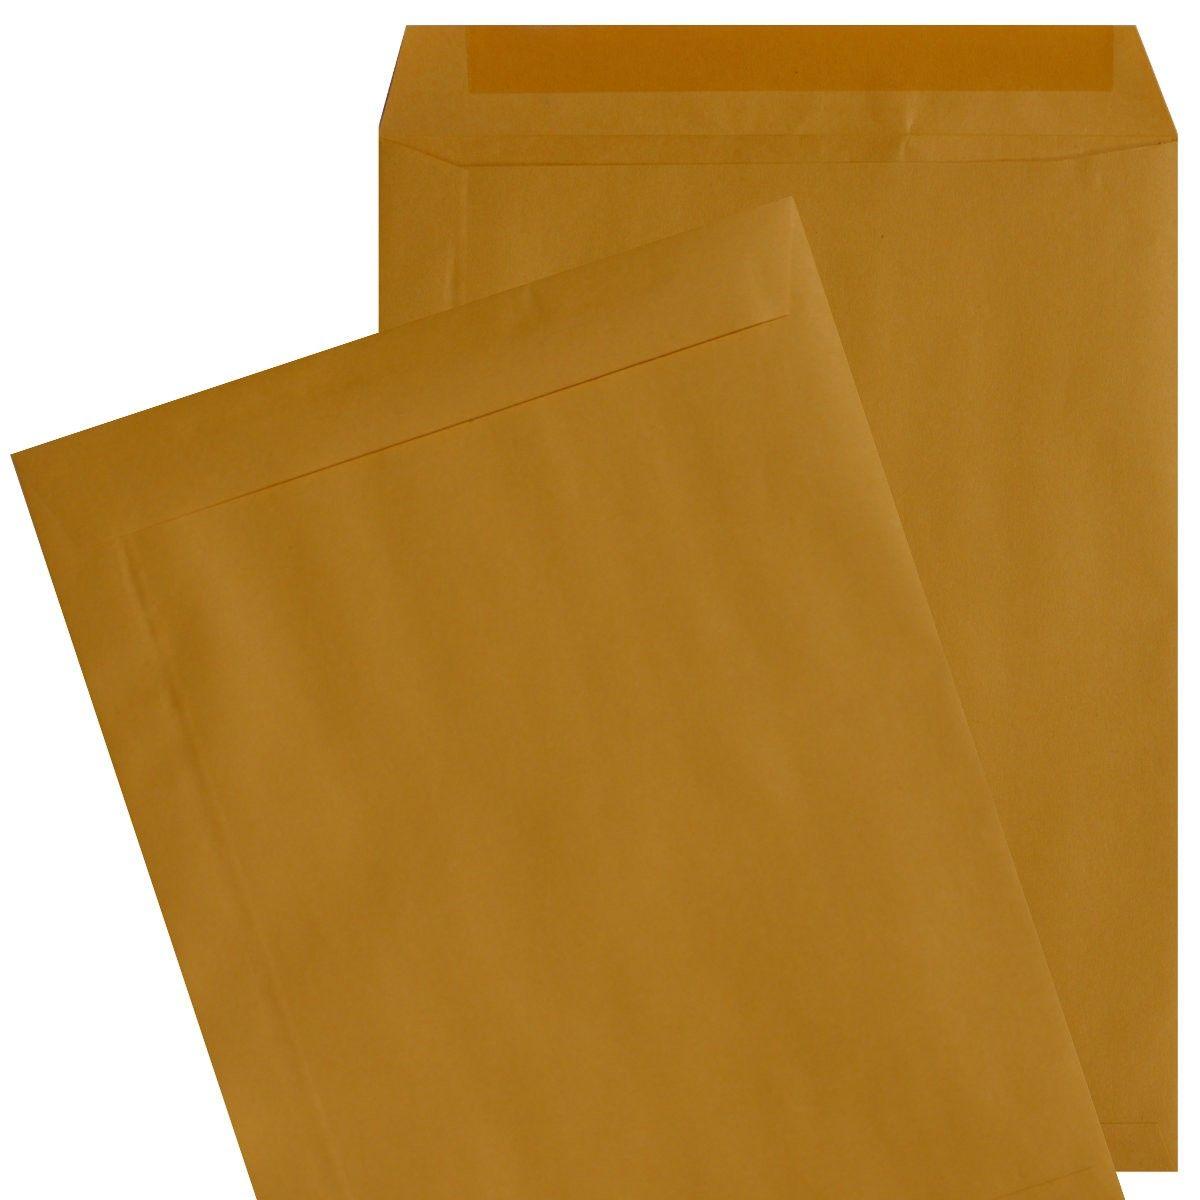 10x13 catalog envelopes 24lb brown kraft 10 x 13 500 box